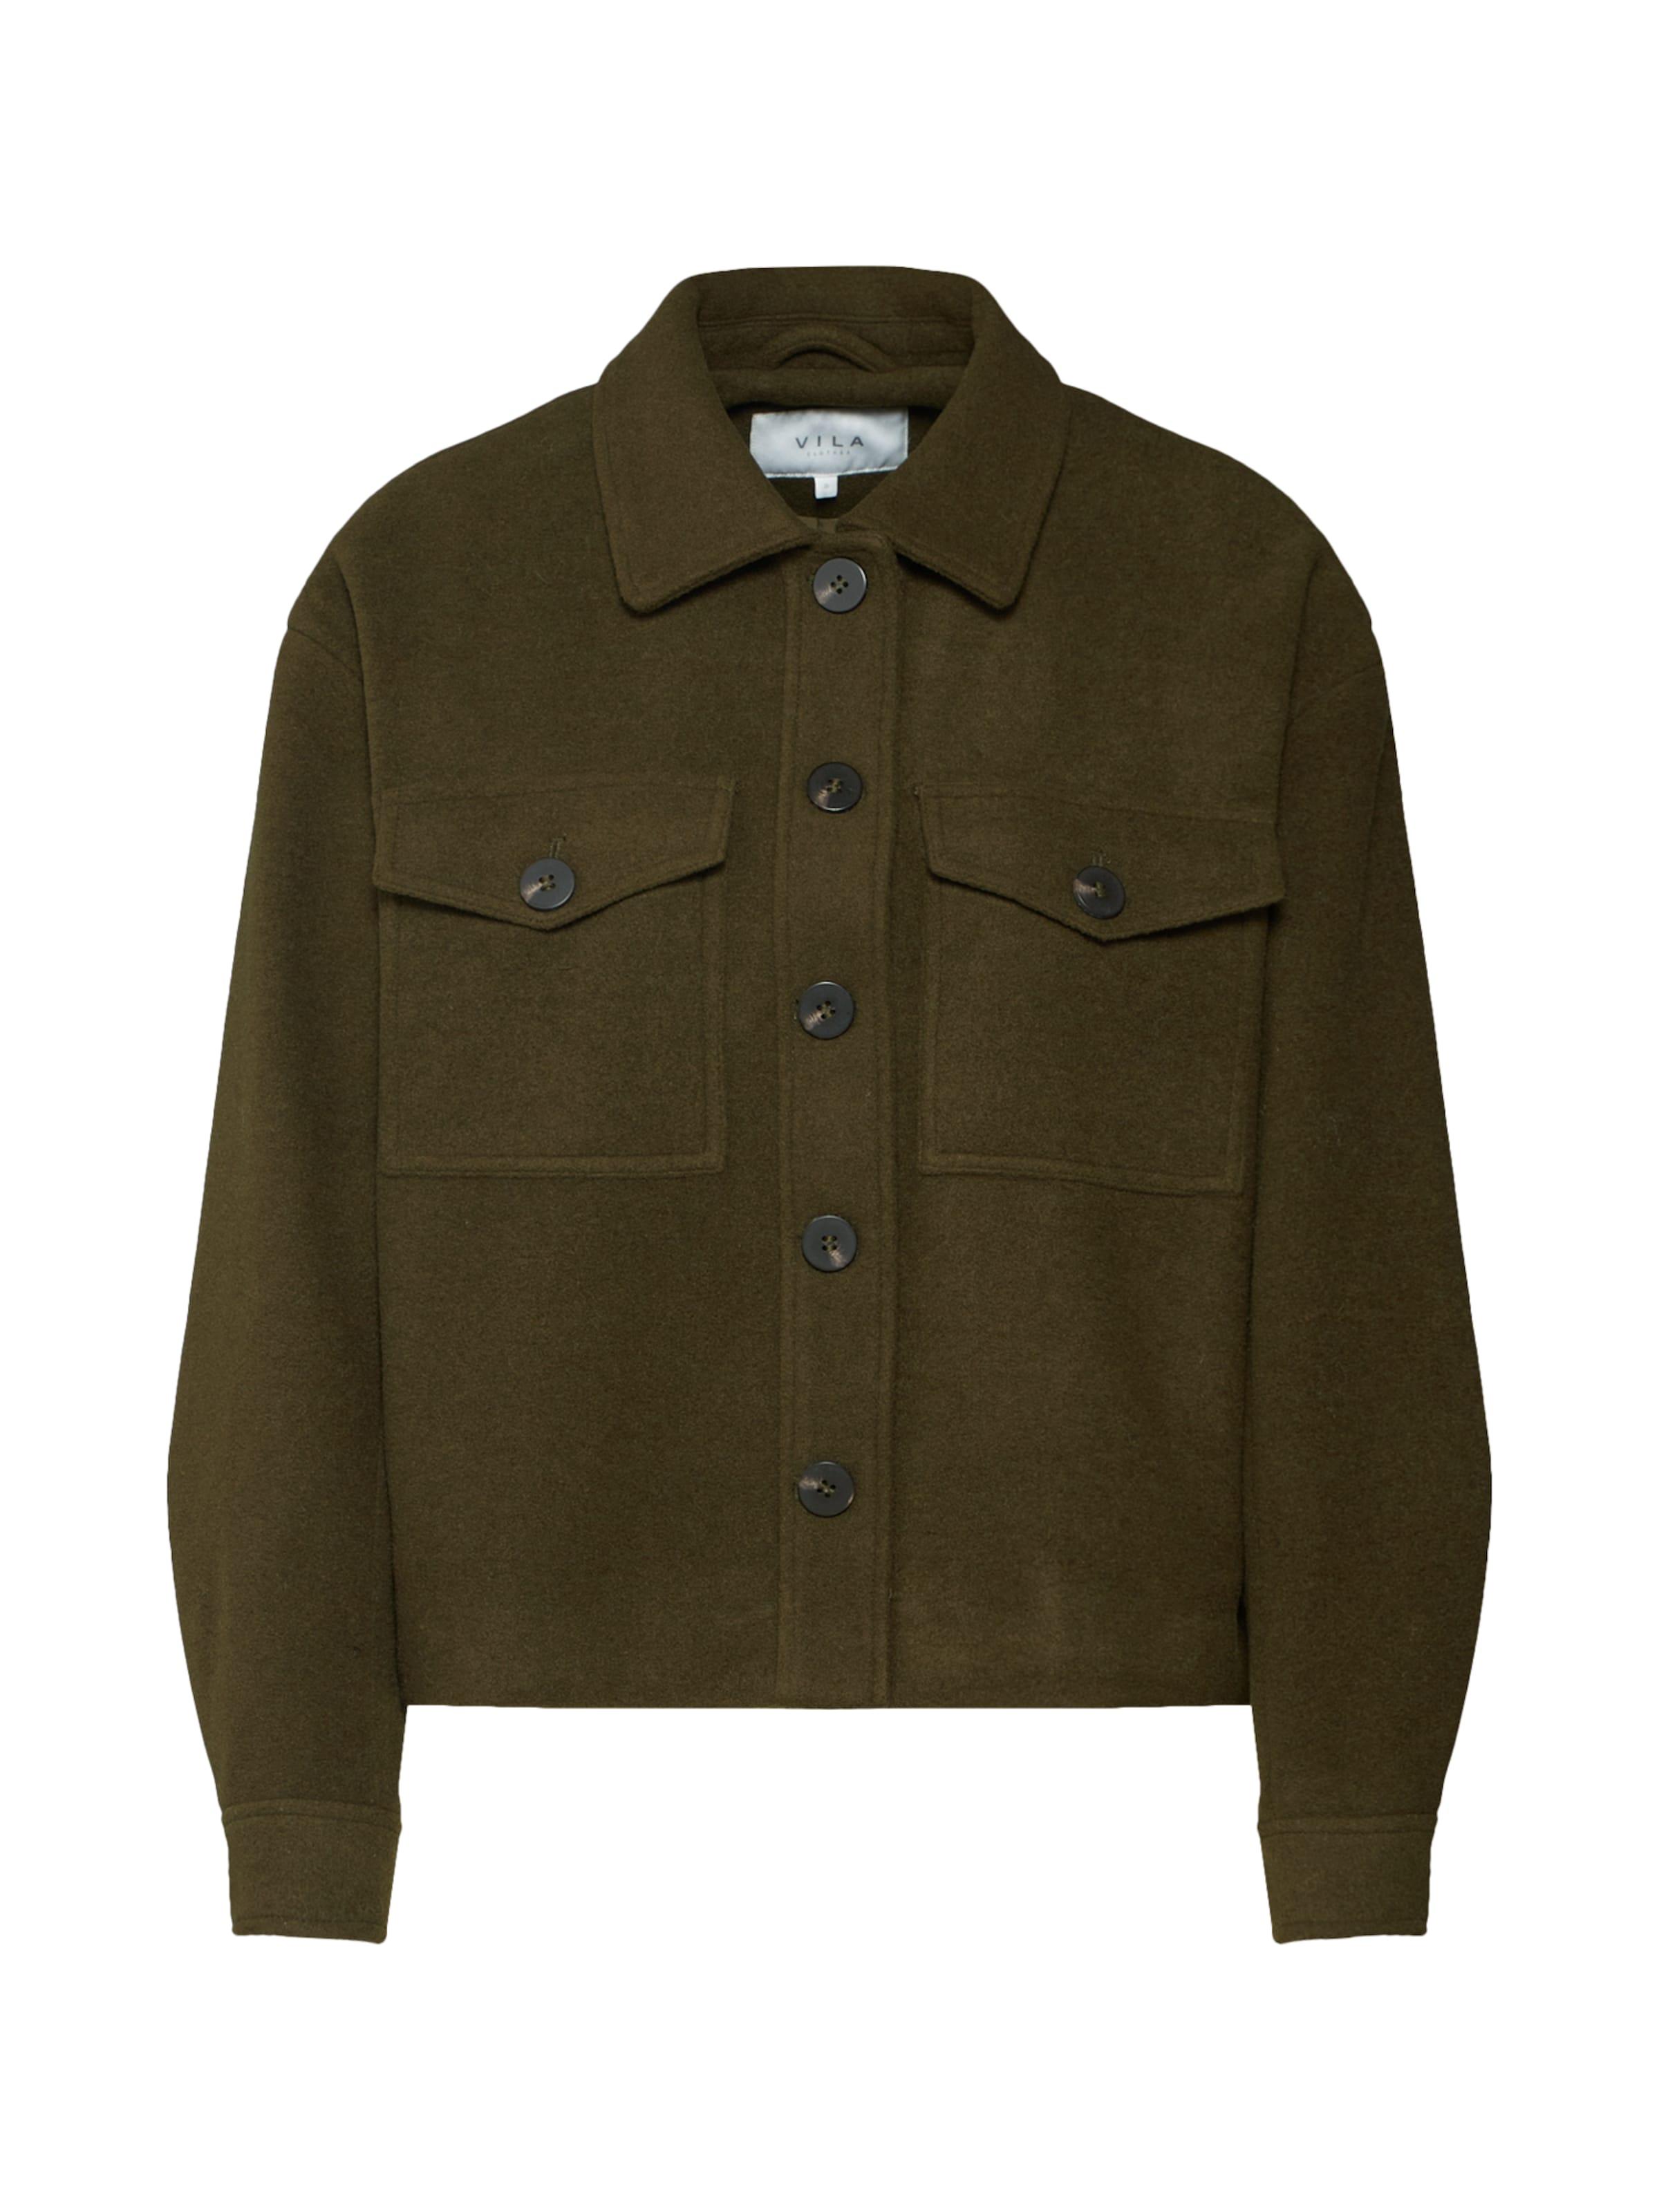 Mi saison 'virumble Veste Wool Short Jacket' En Olive Vila sQCBthrxd